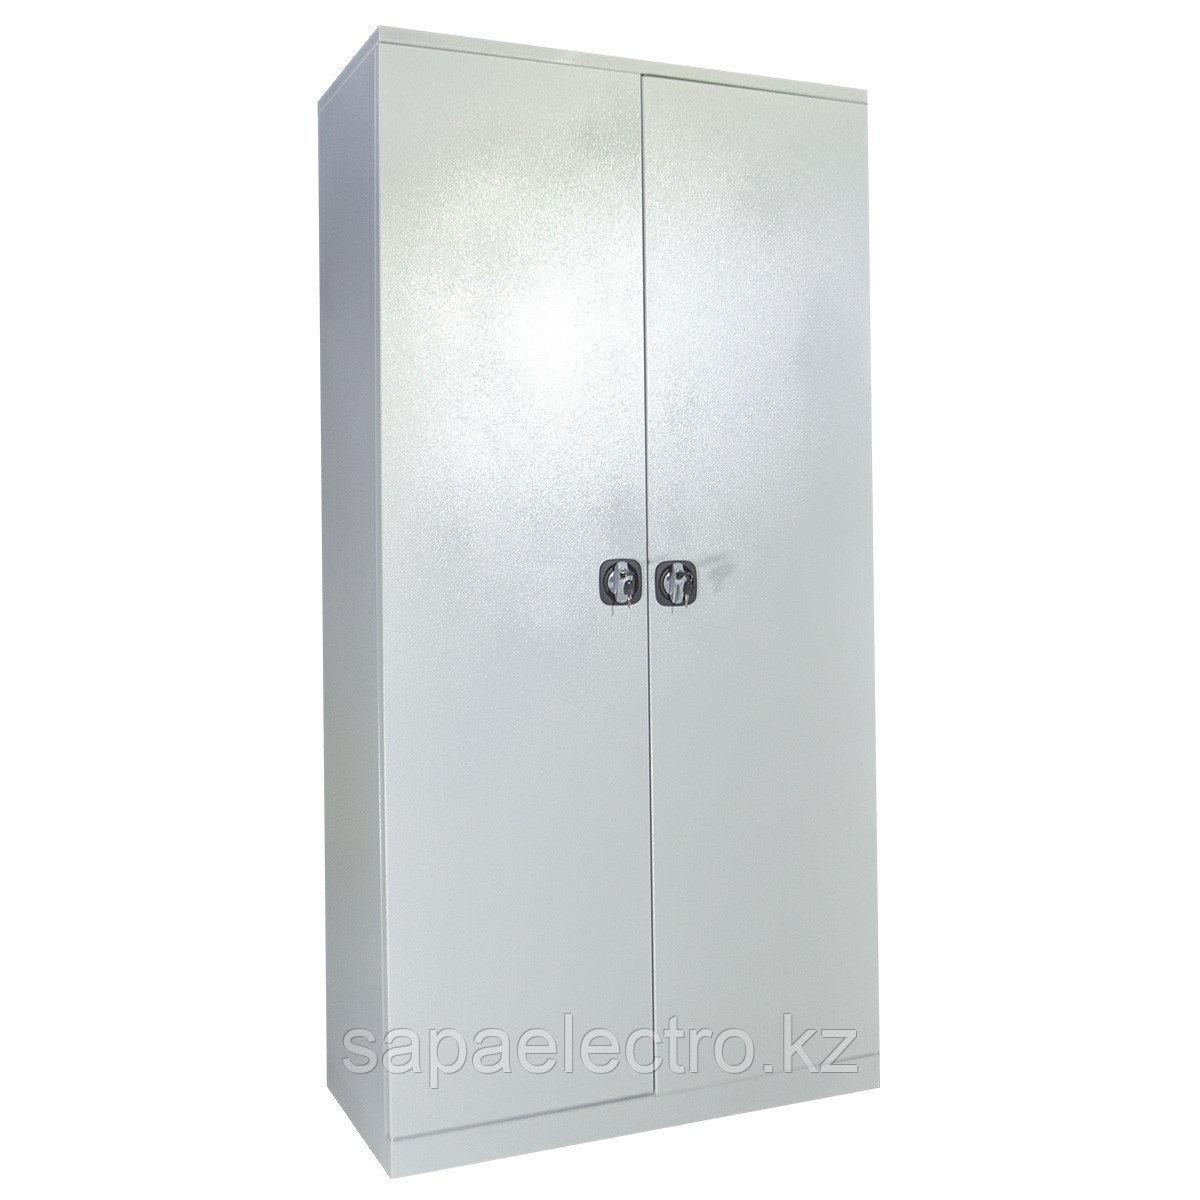 Металл.Шкаф 2-х корп.4полки/2перекладины(1000x2000x